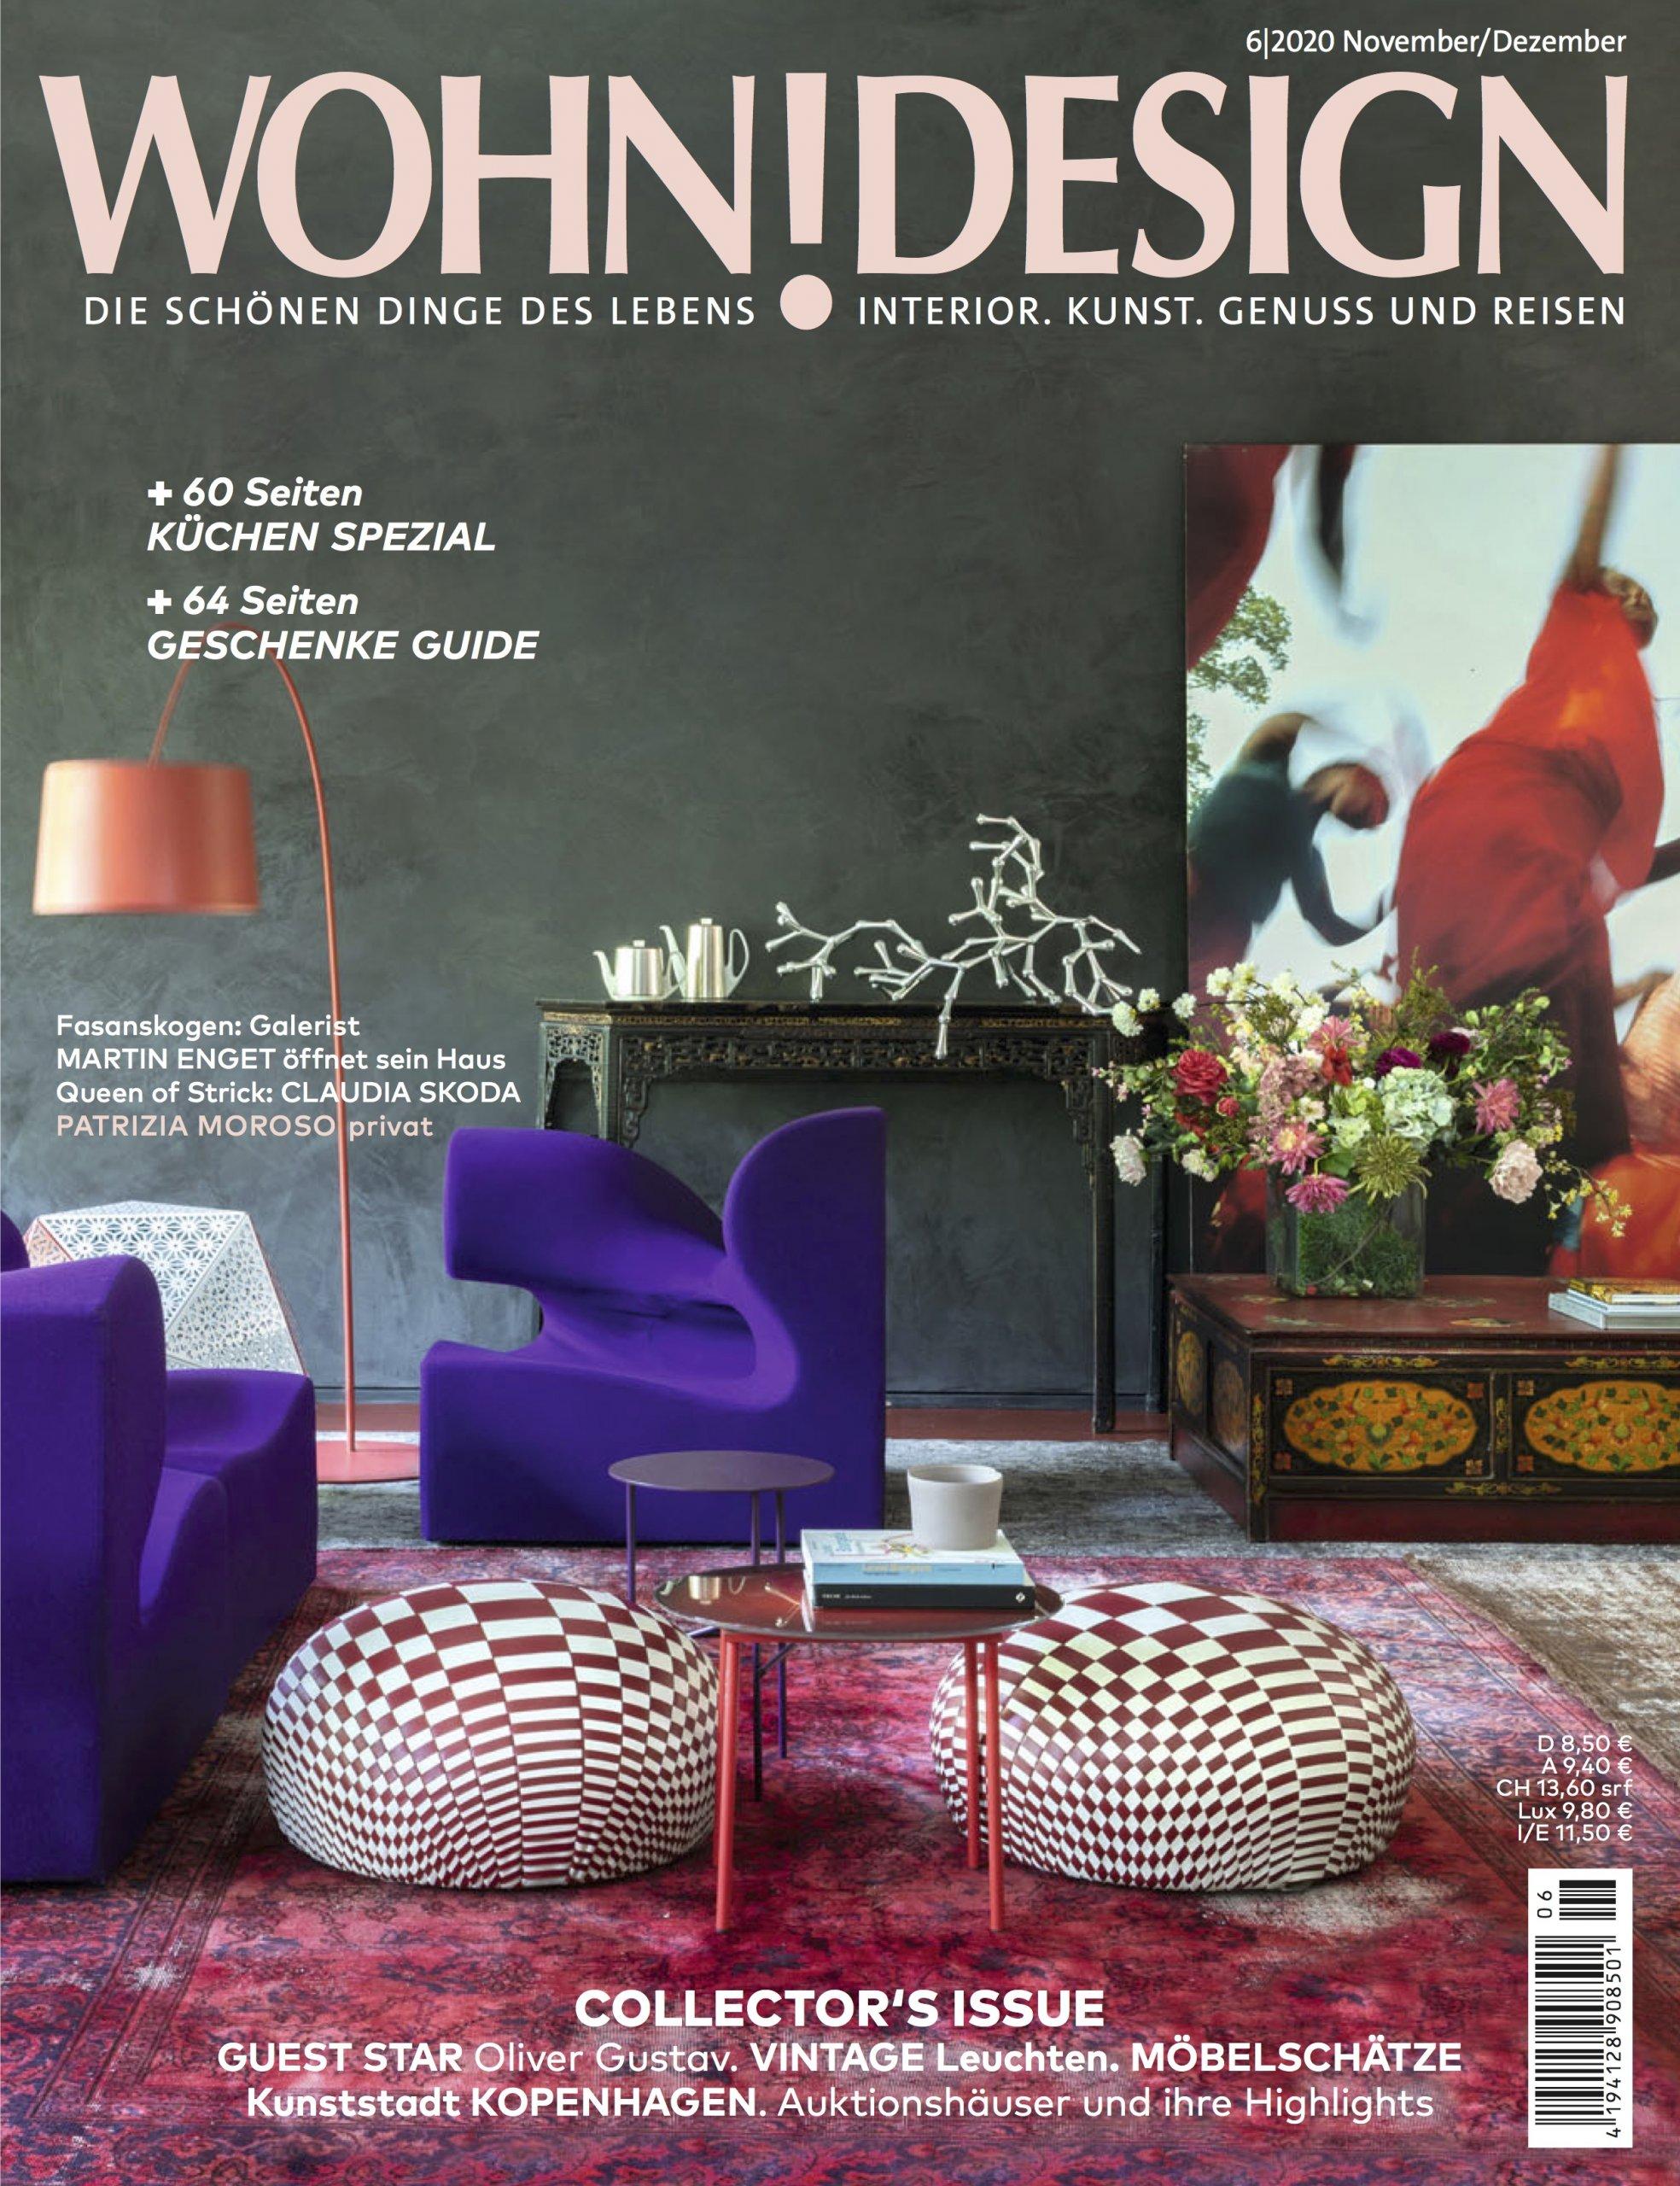 Wohn! Design magazine article studio Oliver Gustav